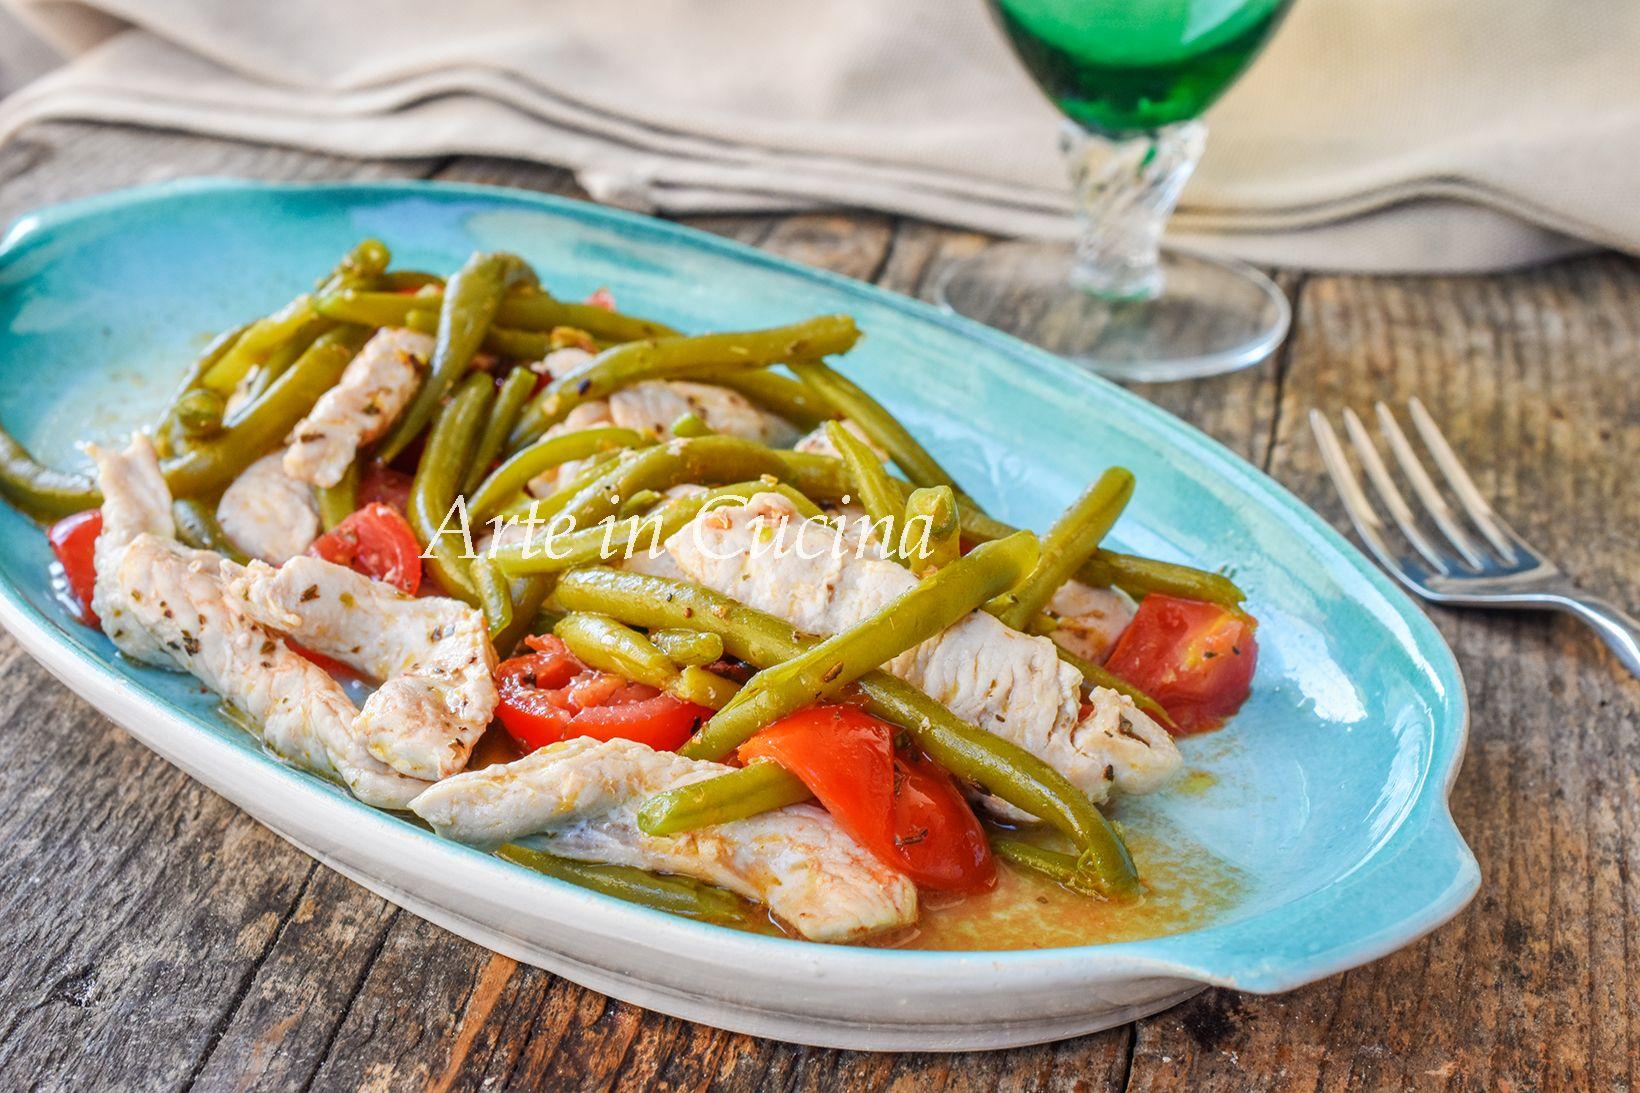 pranzo e cena a dieta leggera